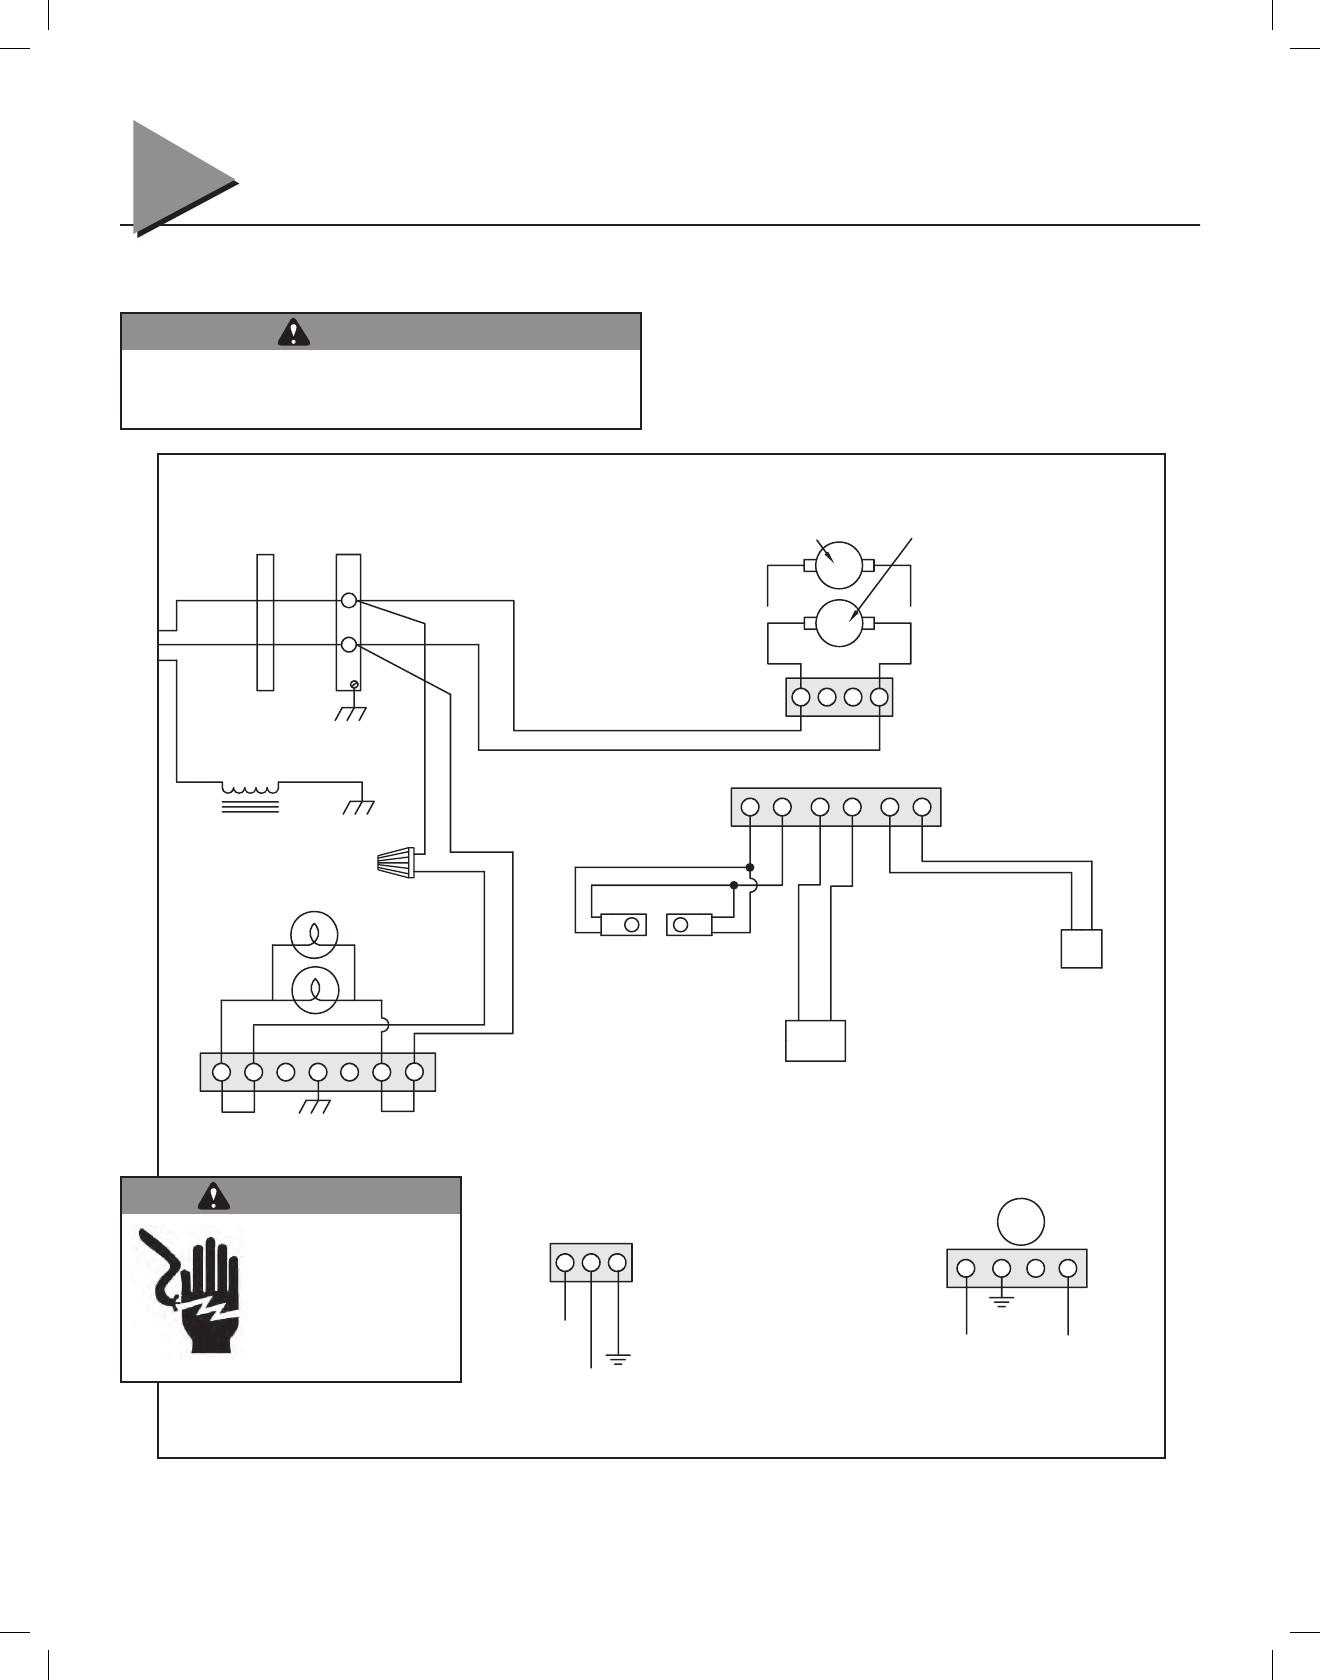 DS_9748] Genie S 40 Wiring Diagram Download DiagramWigeg Weveq Shopa Mohammedshrine Librar Wiring 101